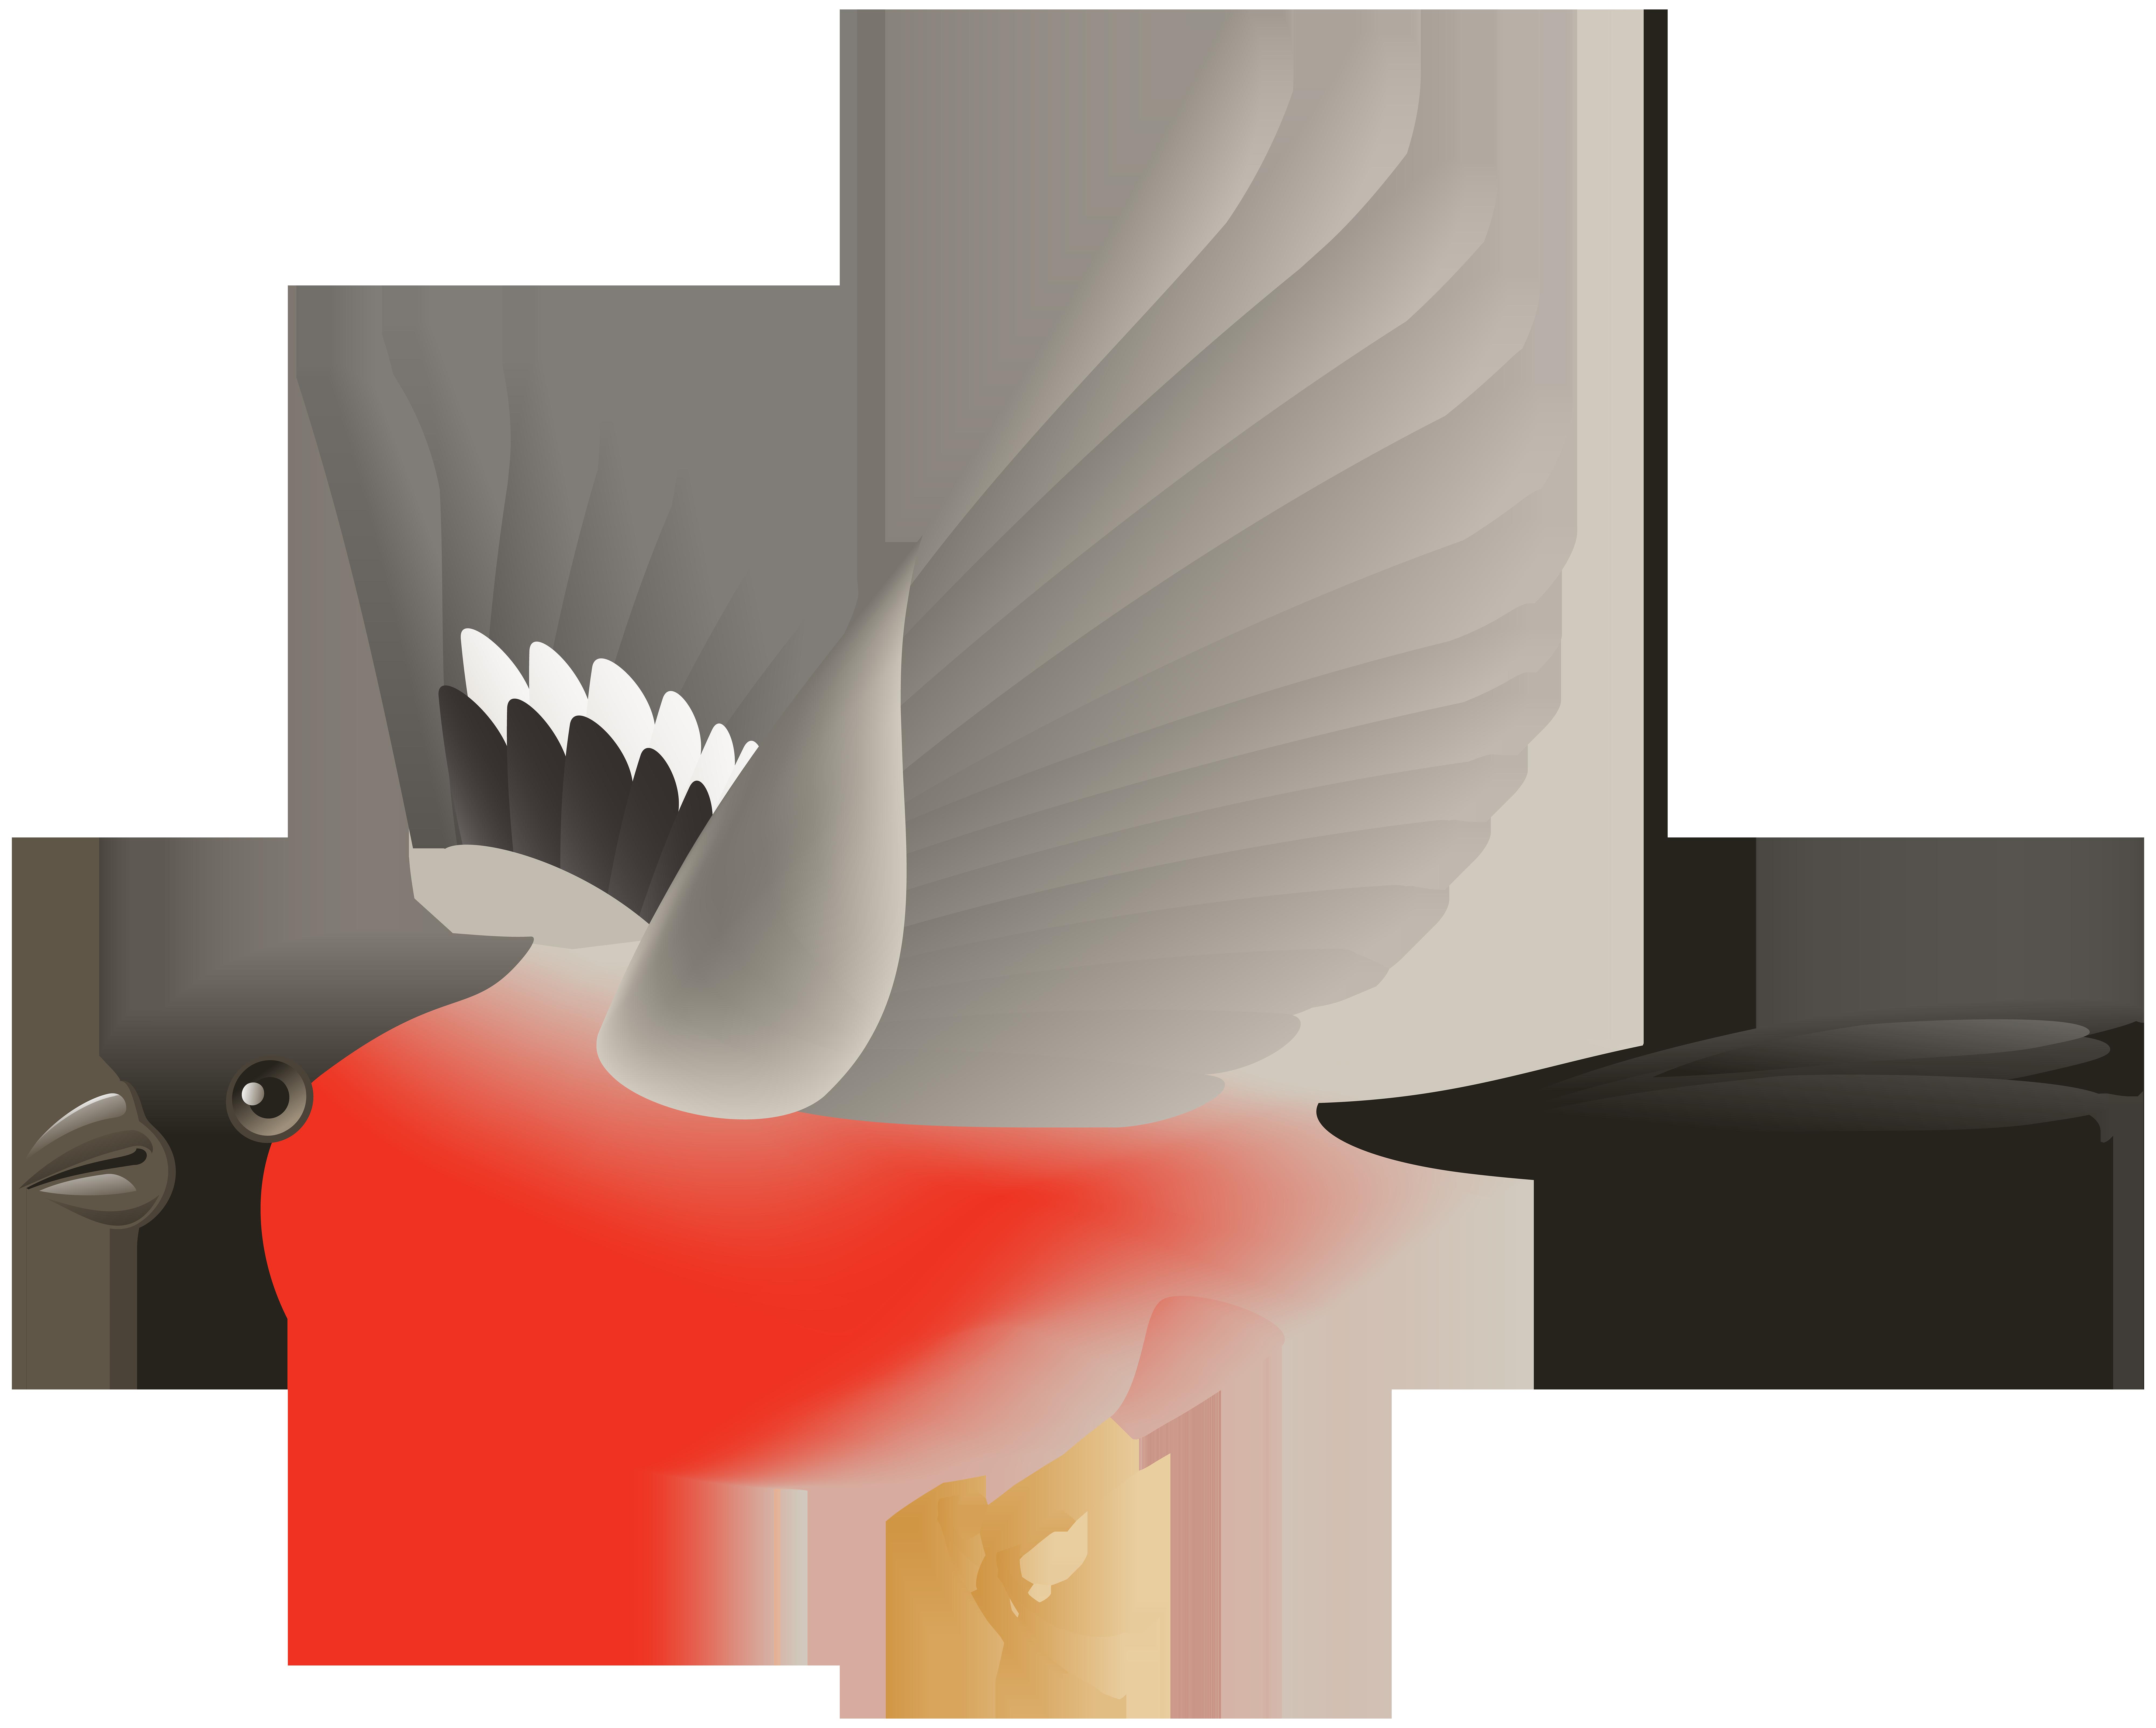 8000x6411 Red Flying Bird Transparent Clip Art Imageu200b Gallery Yopriceville